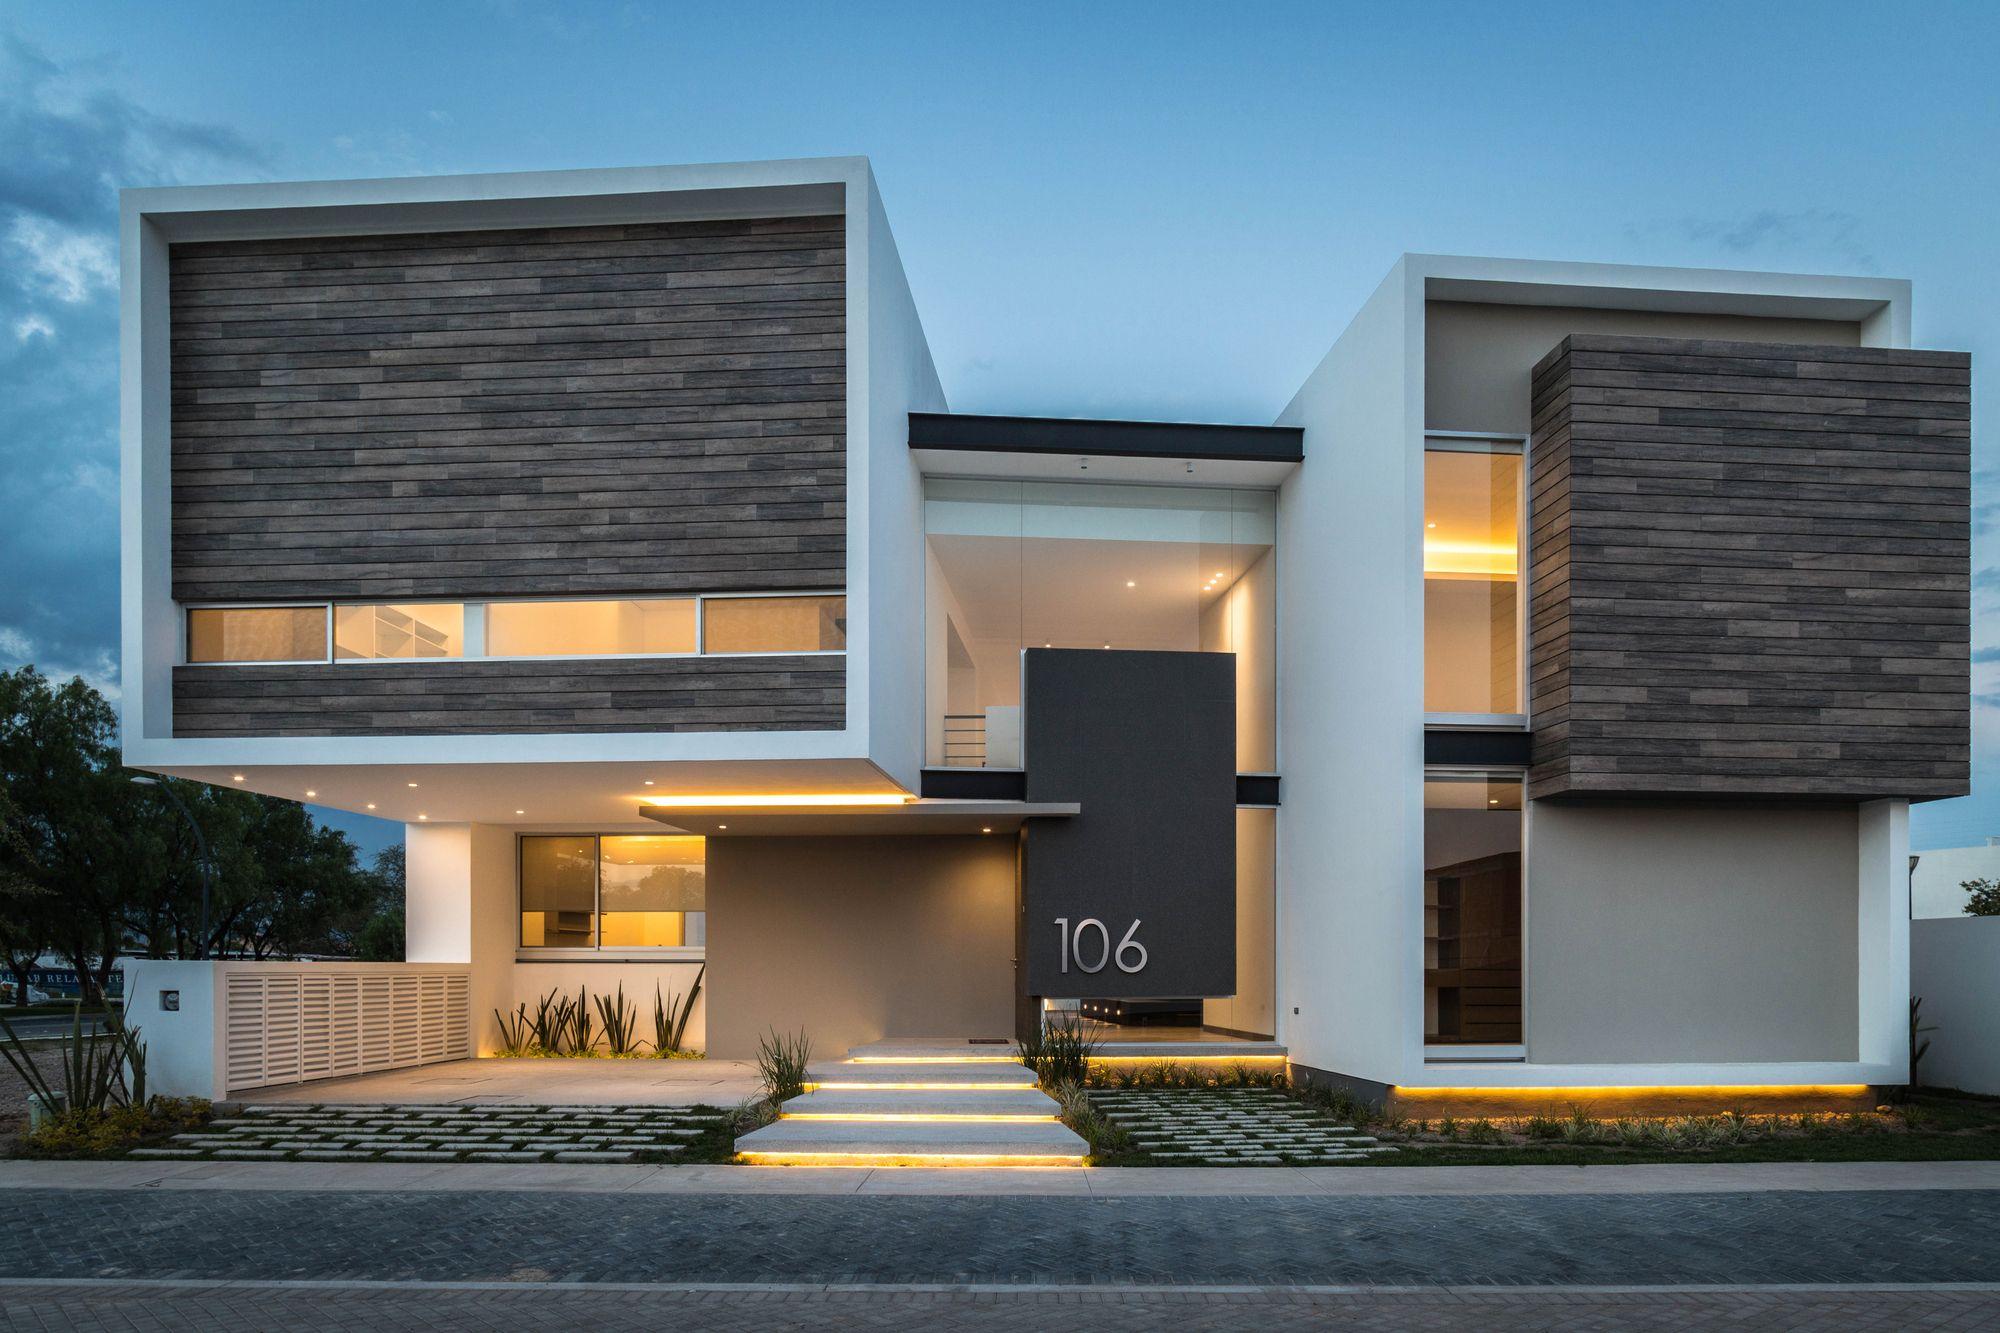 Galer a de casa r p adi arquitectura y dise o interior - Casas arquitectura moderna ...